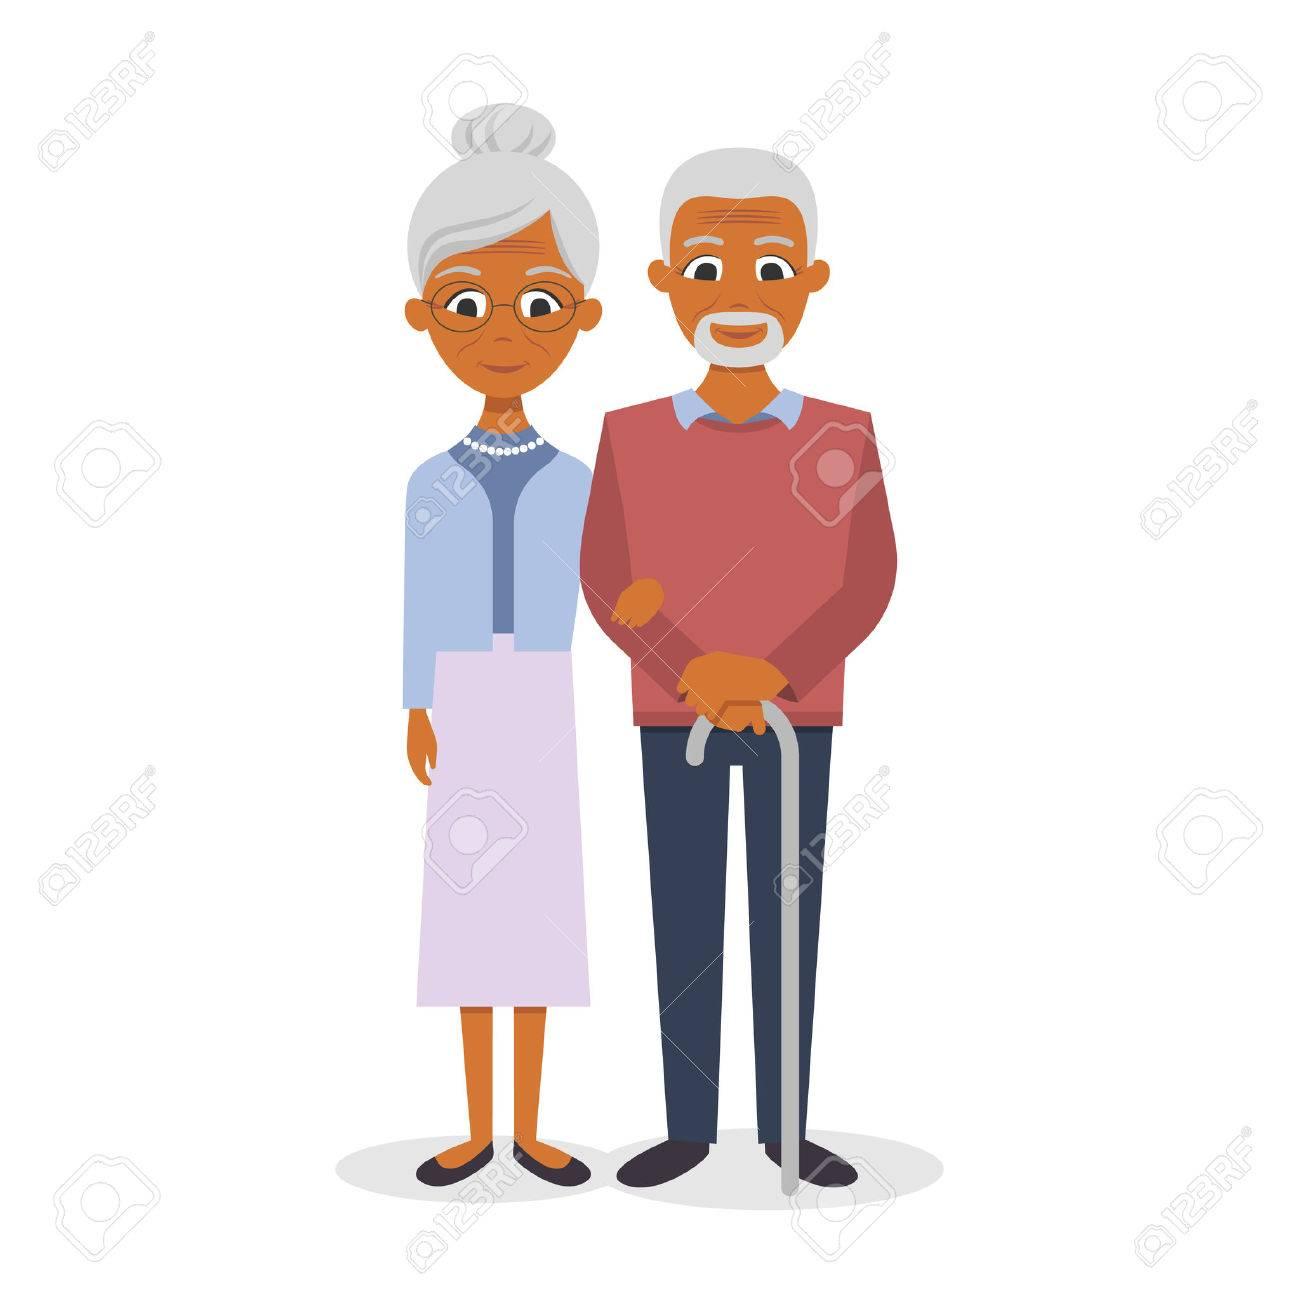 Vector illustration of happy smiling senior couple - 51420529